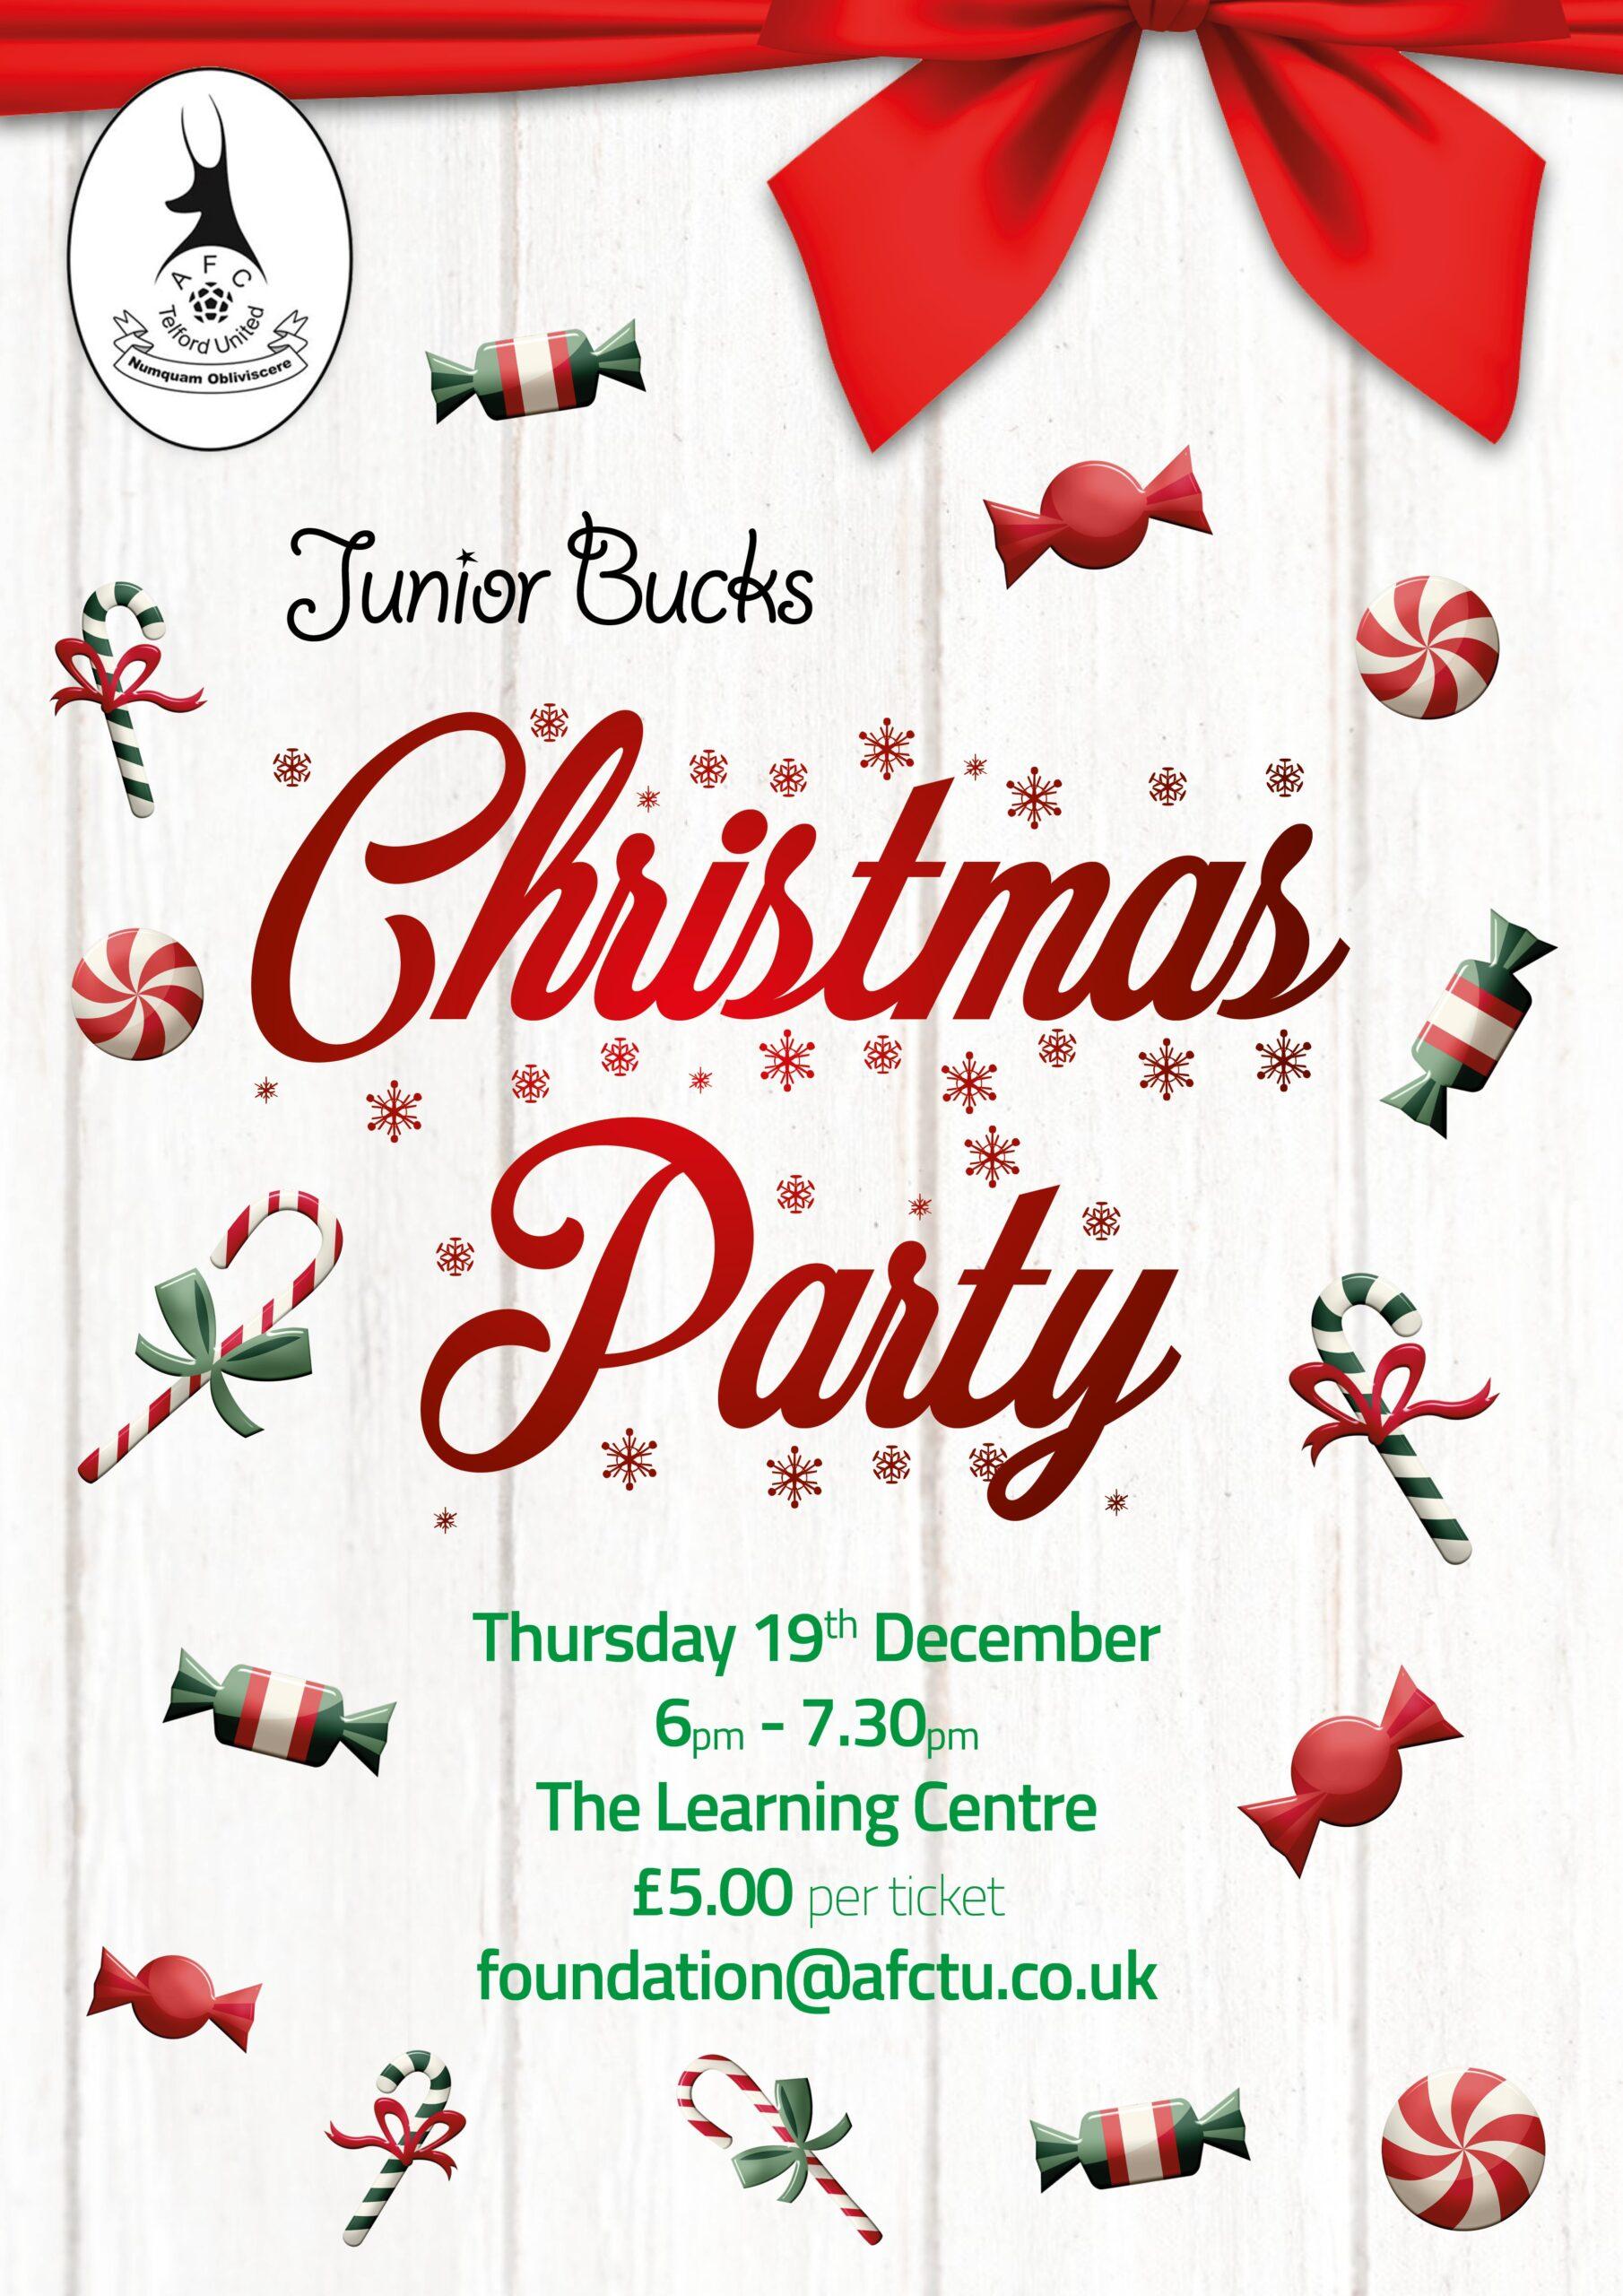 Junior Bucks Christmas Party